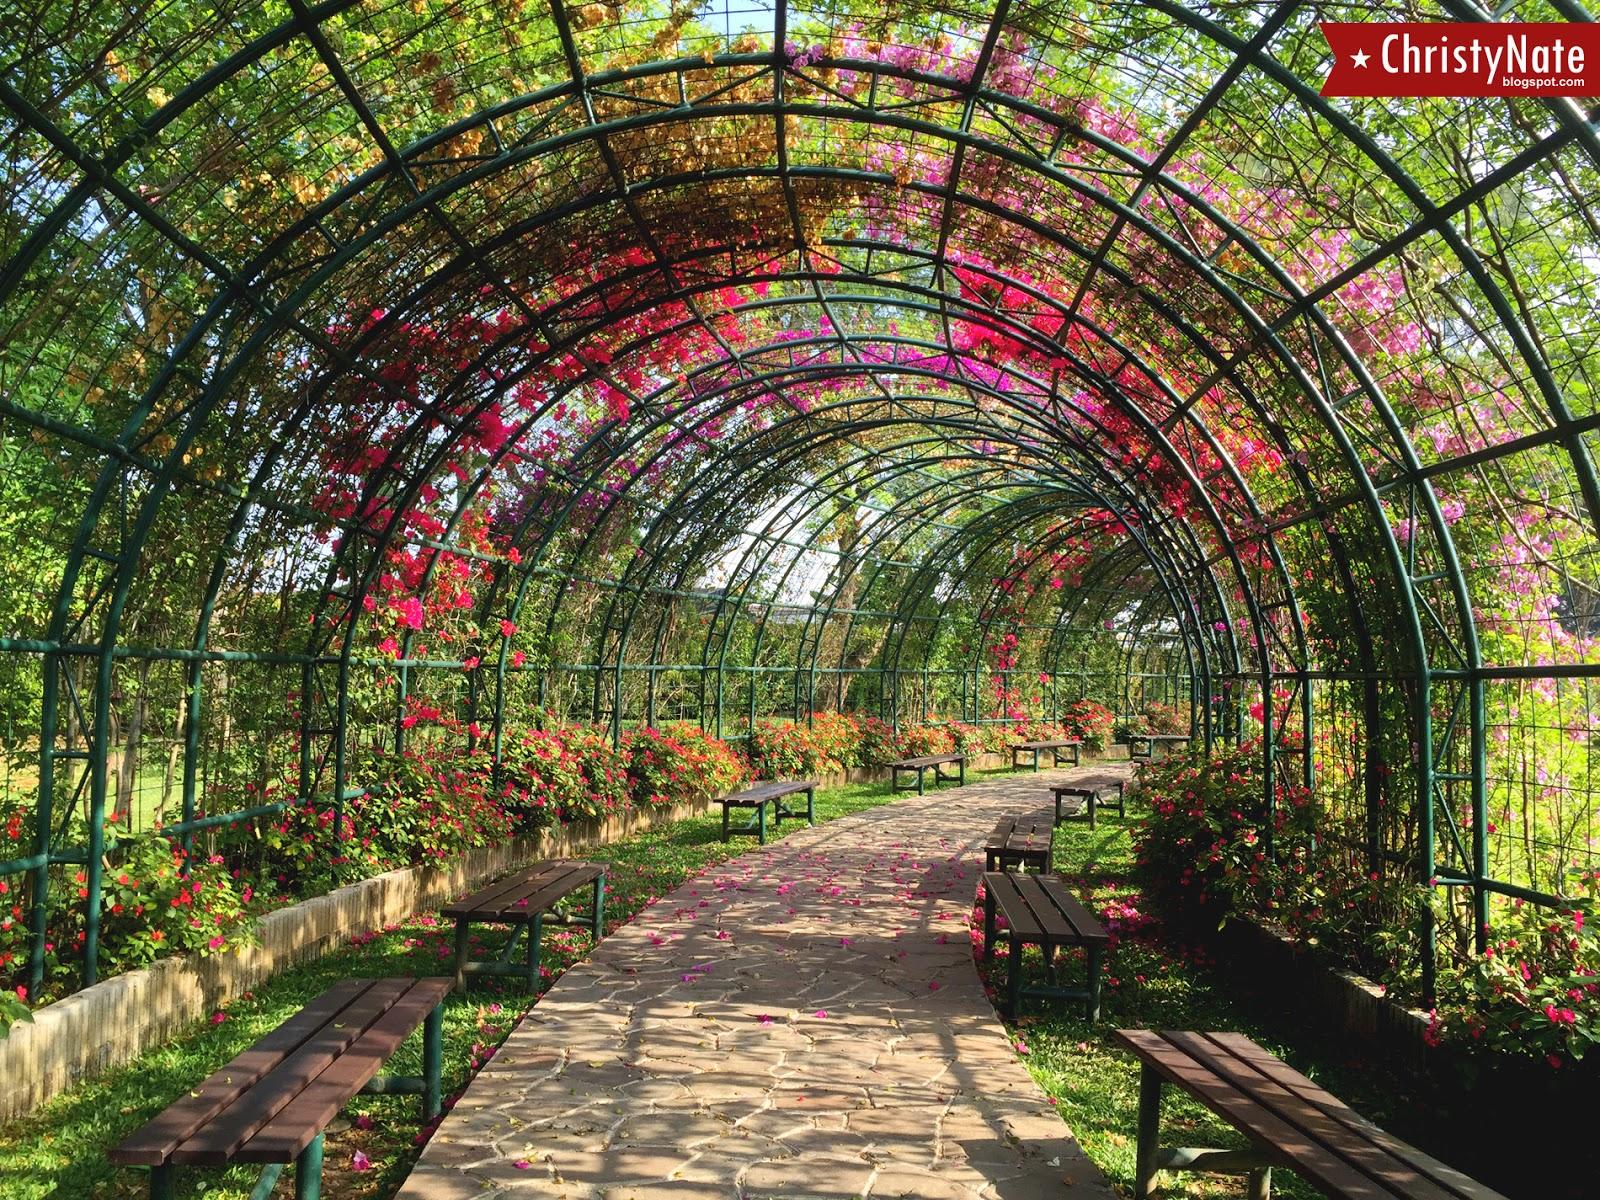 Indonesia 4 Kebun Bunga Nggak Kalah Epic Sama Taman Kota